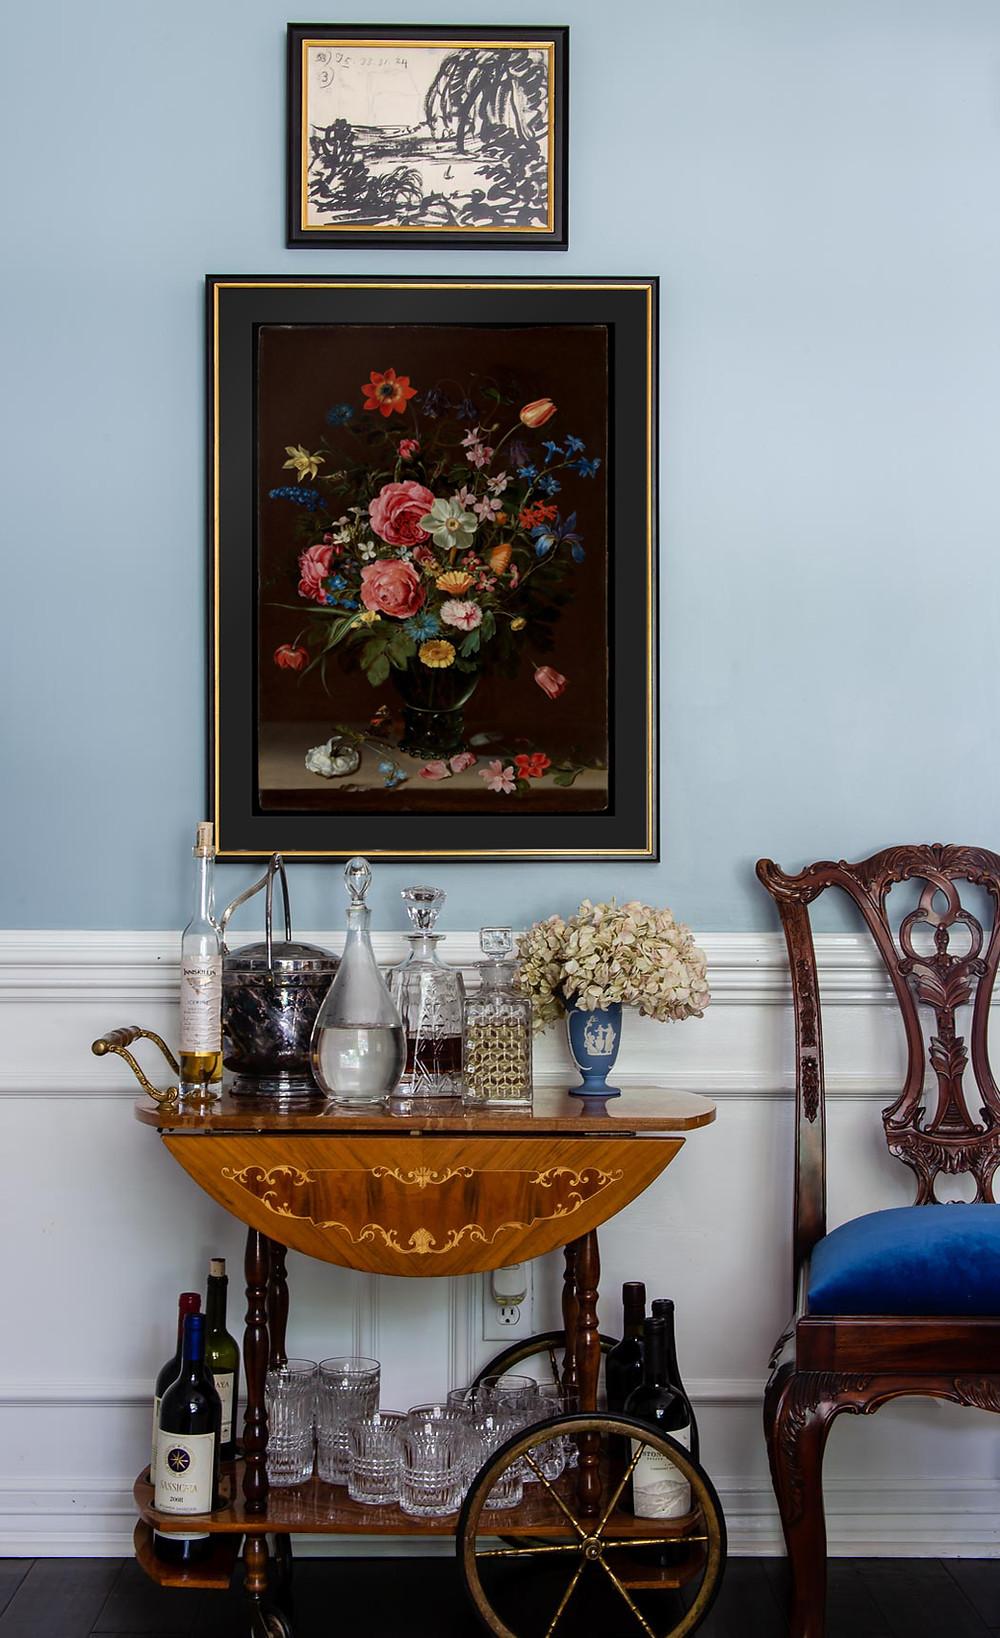 level frames art, floral art and antique bar cart